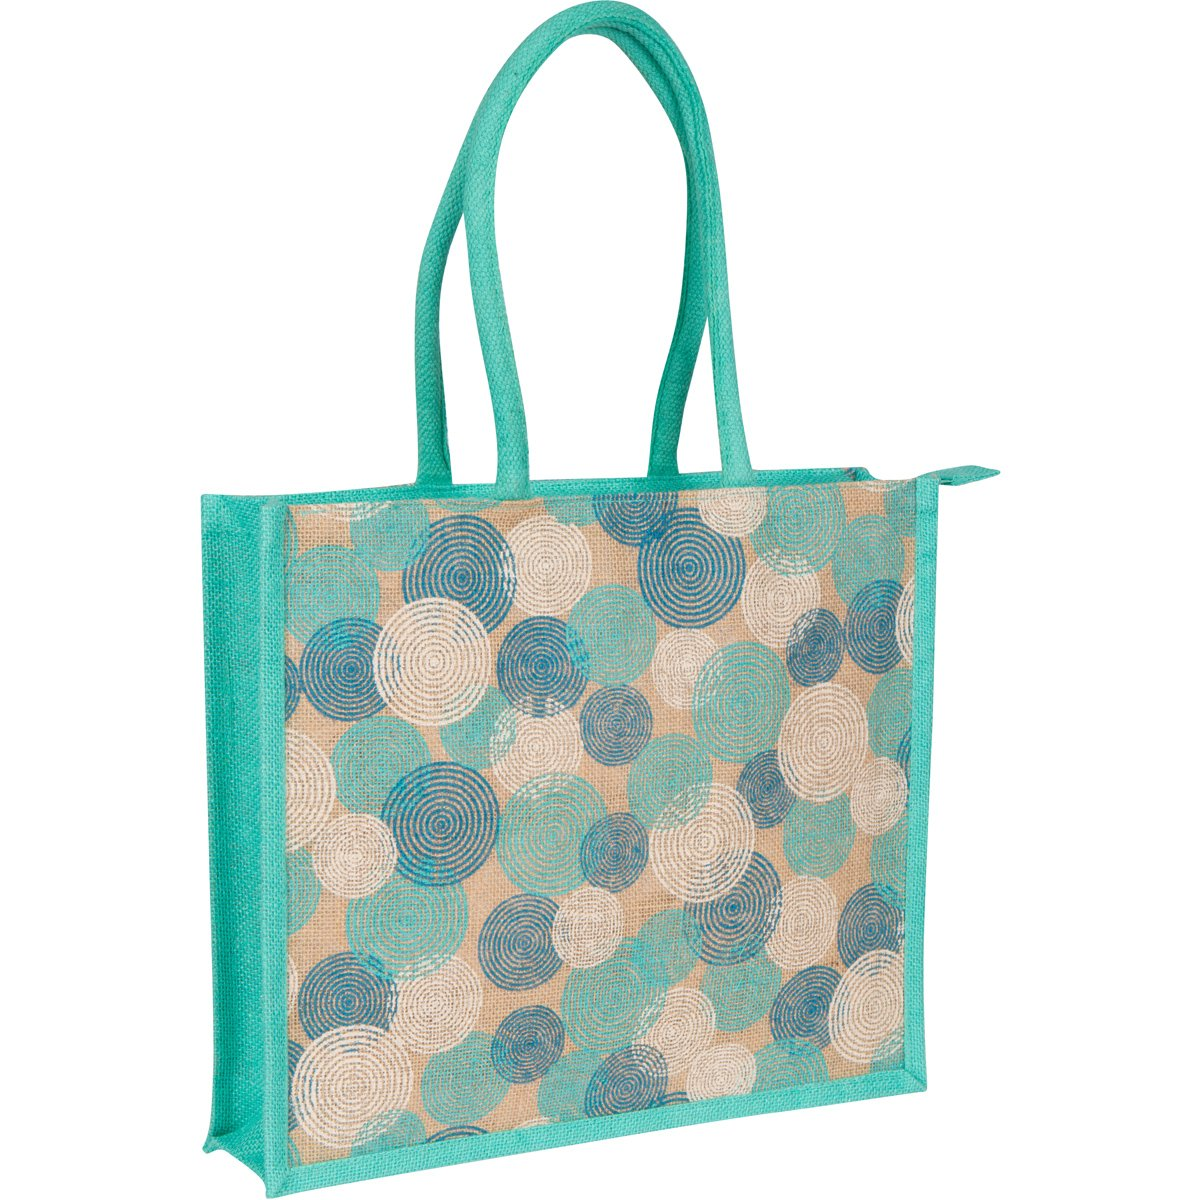 Eco-friendly Mystic Aqua Women's Beach Tote - Shopping Bag